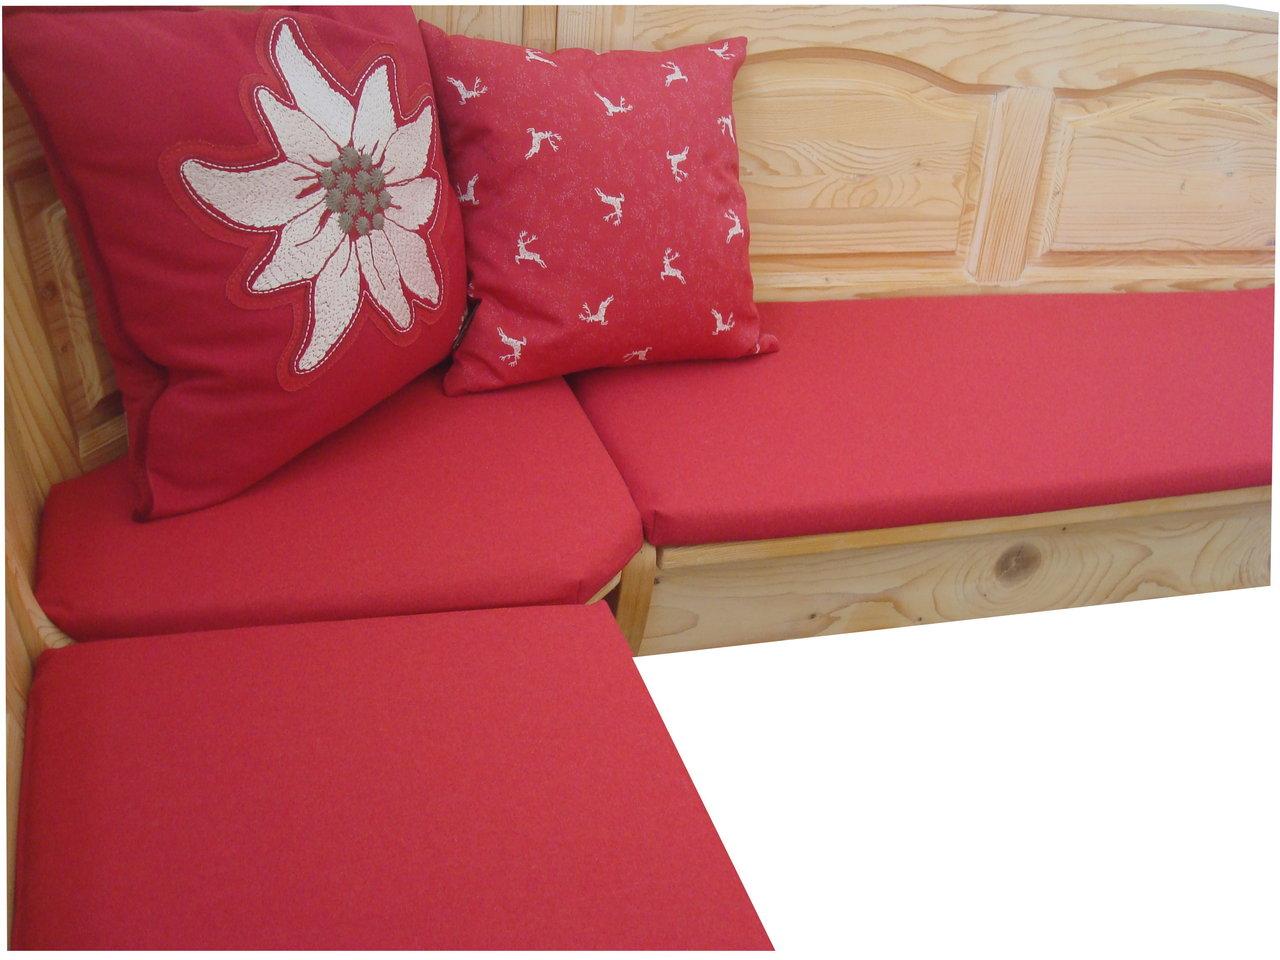 bequemer sitzen wollland lodenstoff. Black Bedroom Furniture Sets. Home Design Ideas